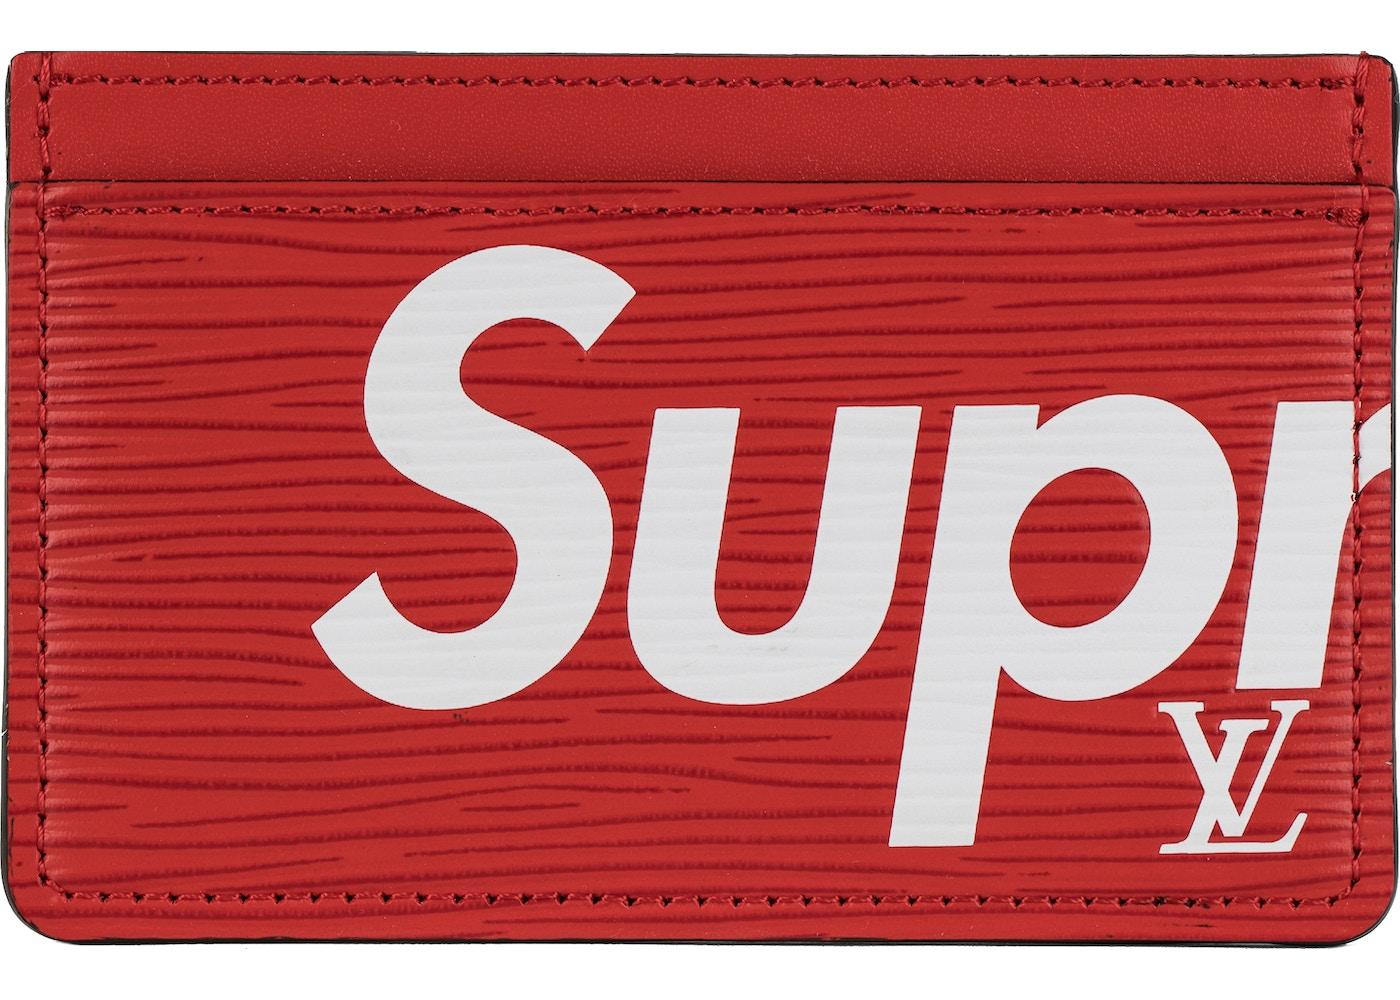 9a214a78bb4ee2 Louis Vuitton x Supreme Porte Carte Simple Epi Red